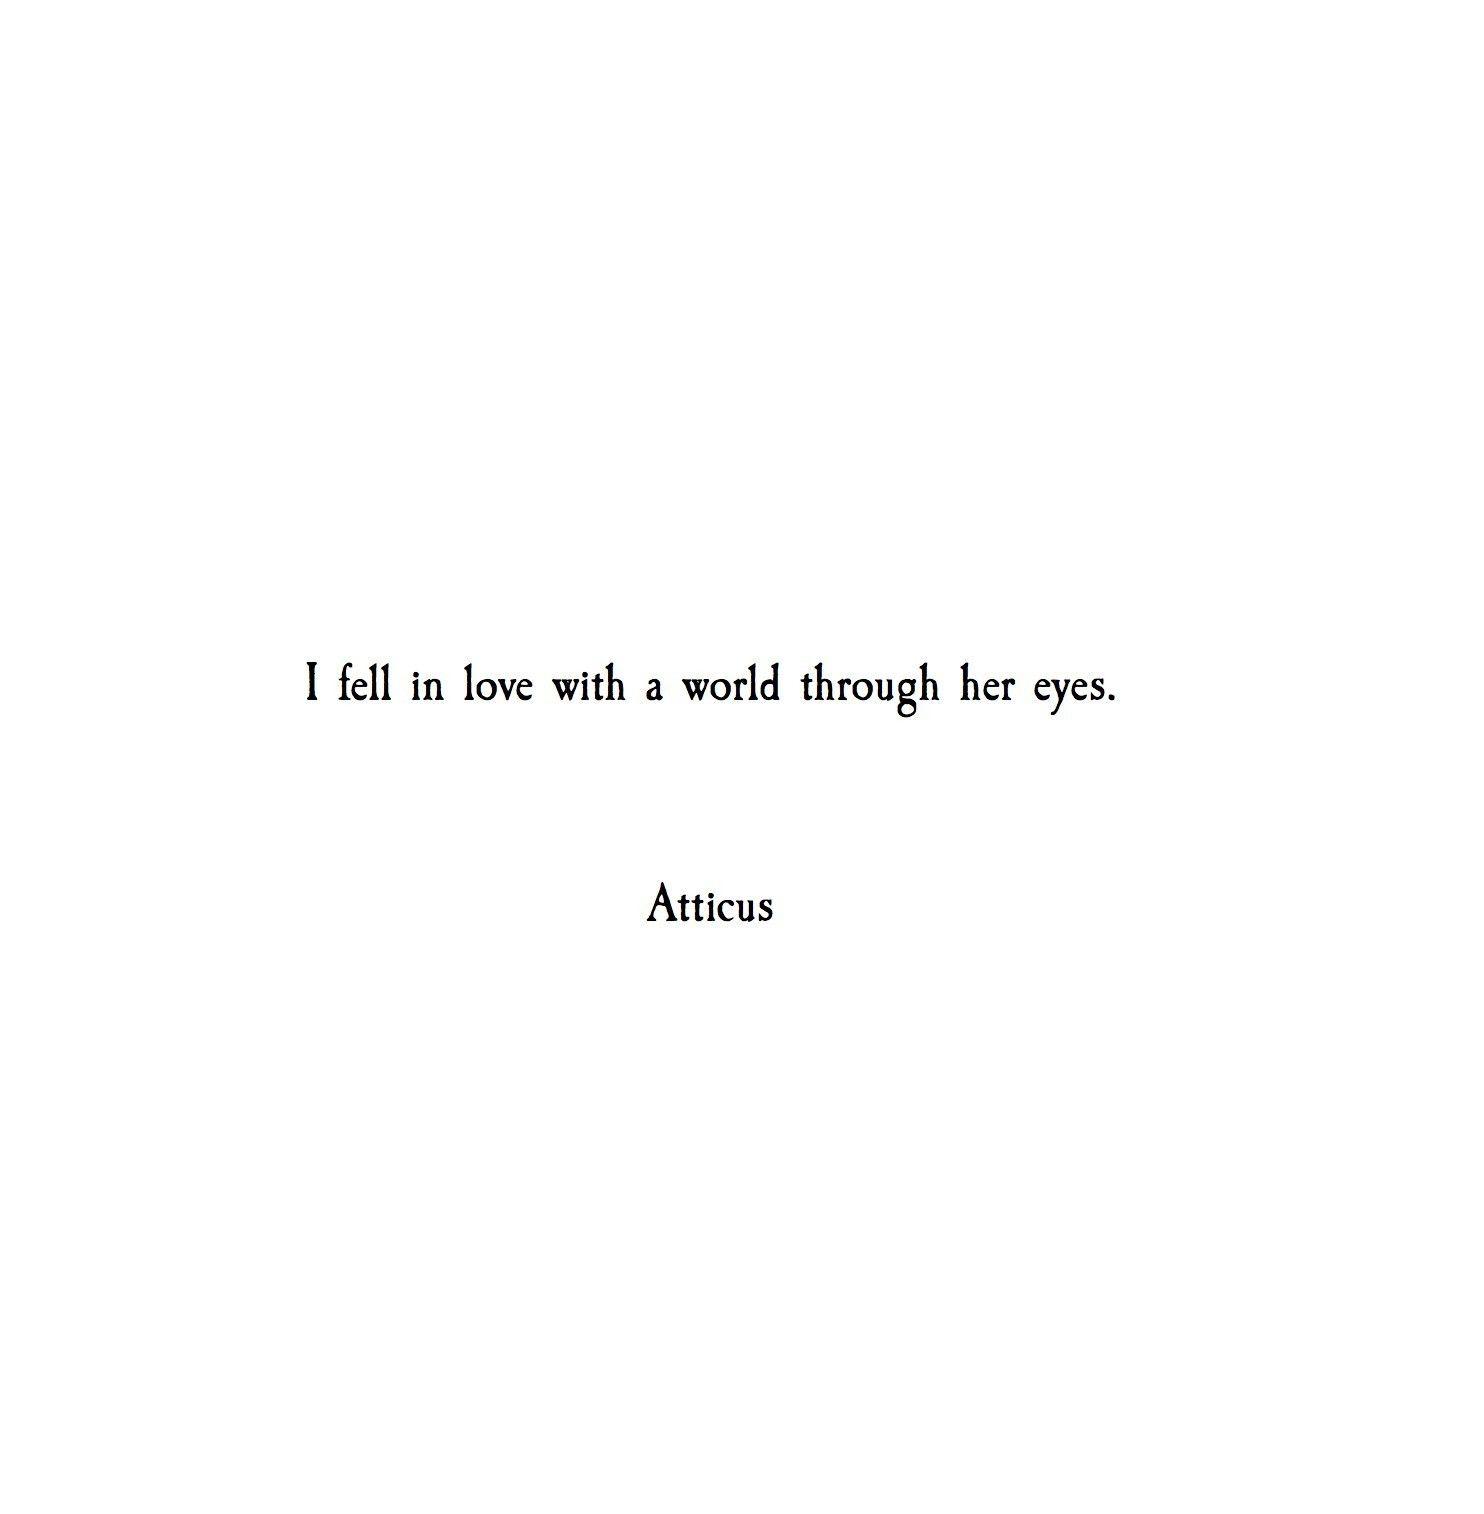 atticuspoetry #atticuspoetry #quotes #poetry | beautiful ...